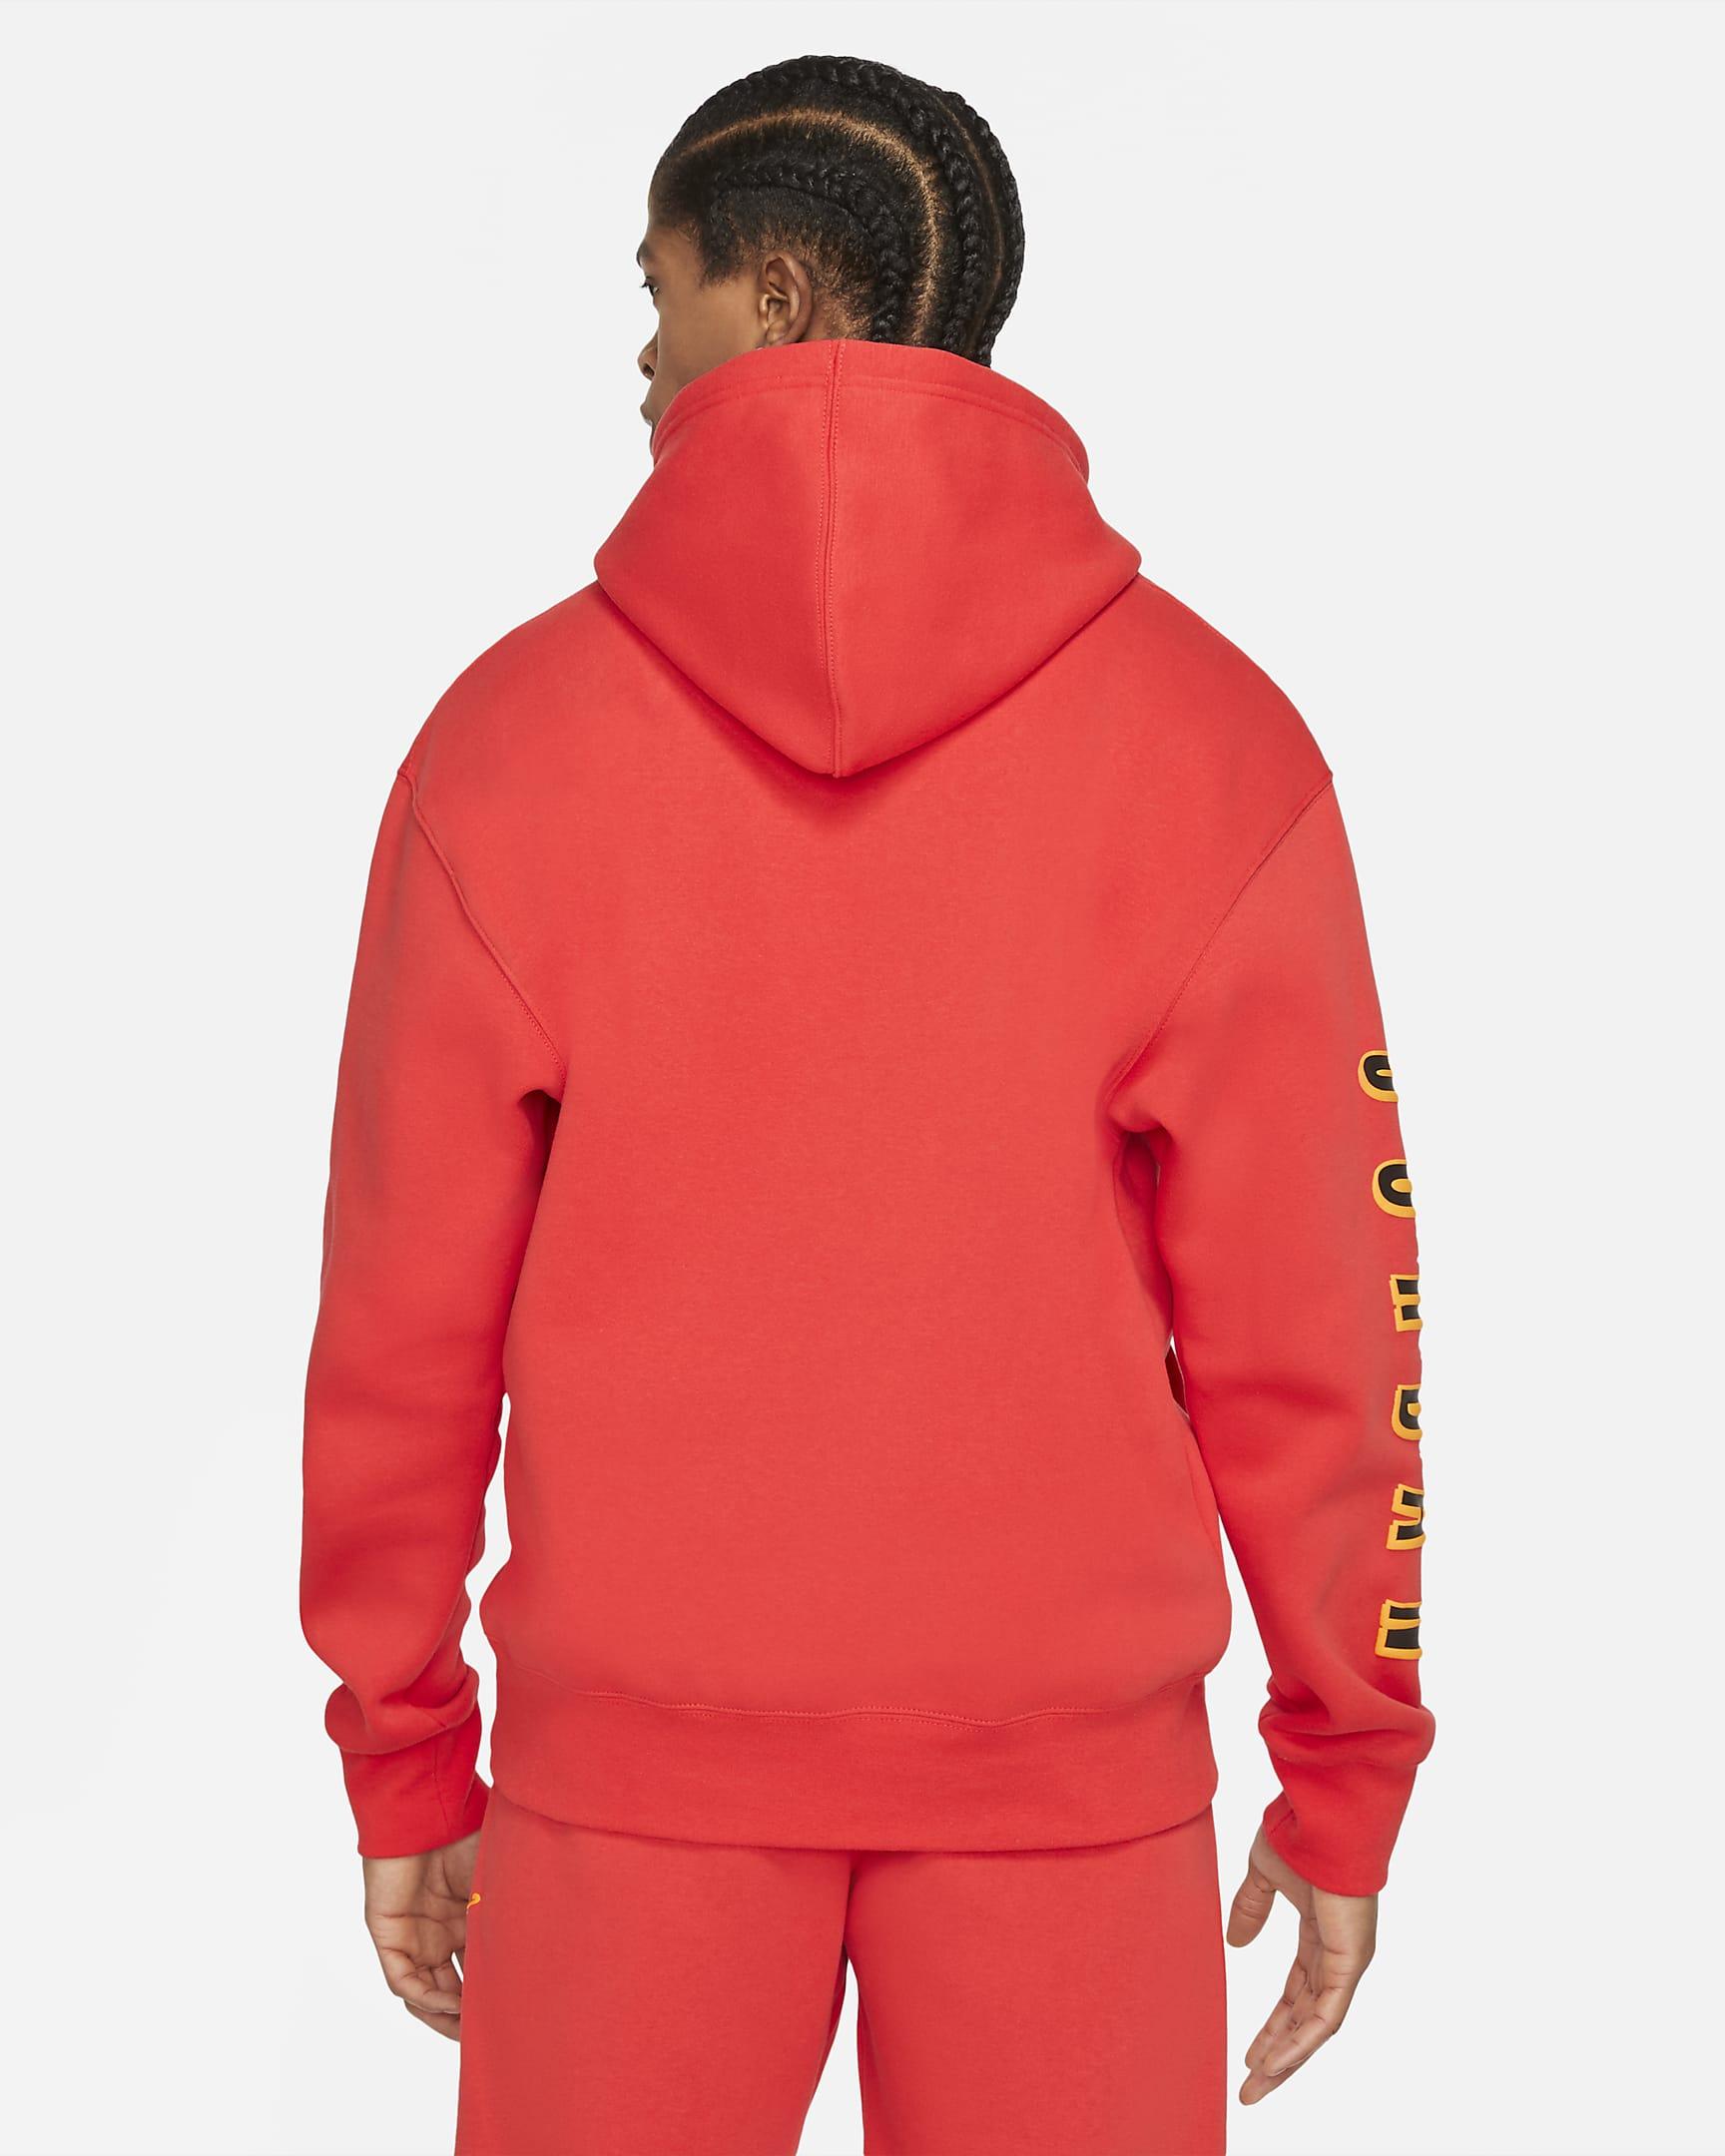 jordan-sport-dna-mens-hbr-pullover-hoodie-1SFRQ0-6